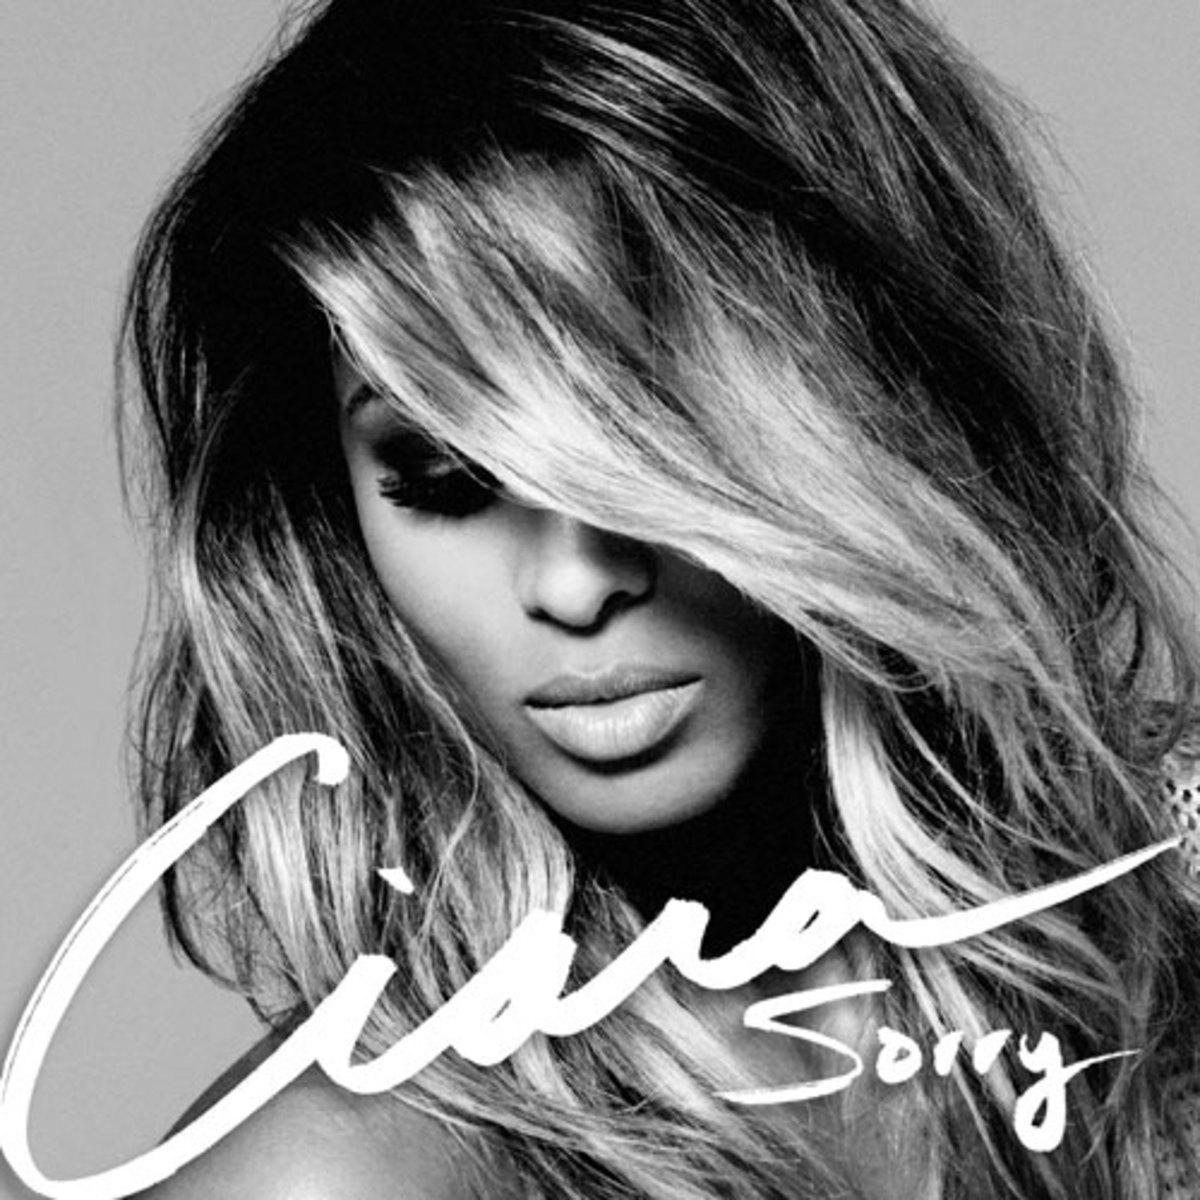 ciara-sorry.jpg